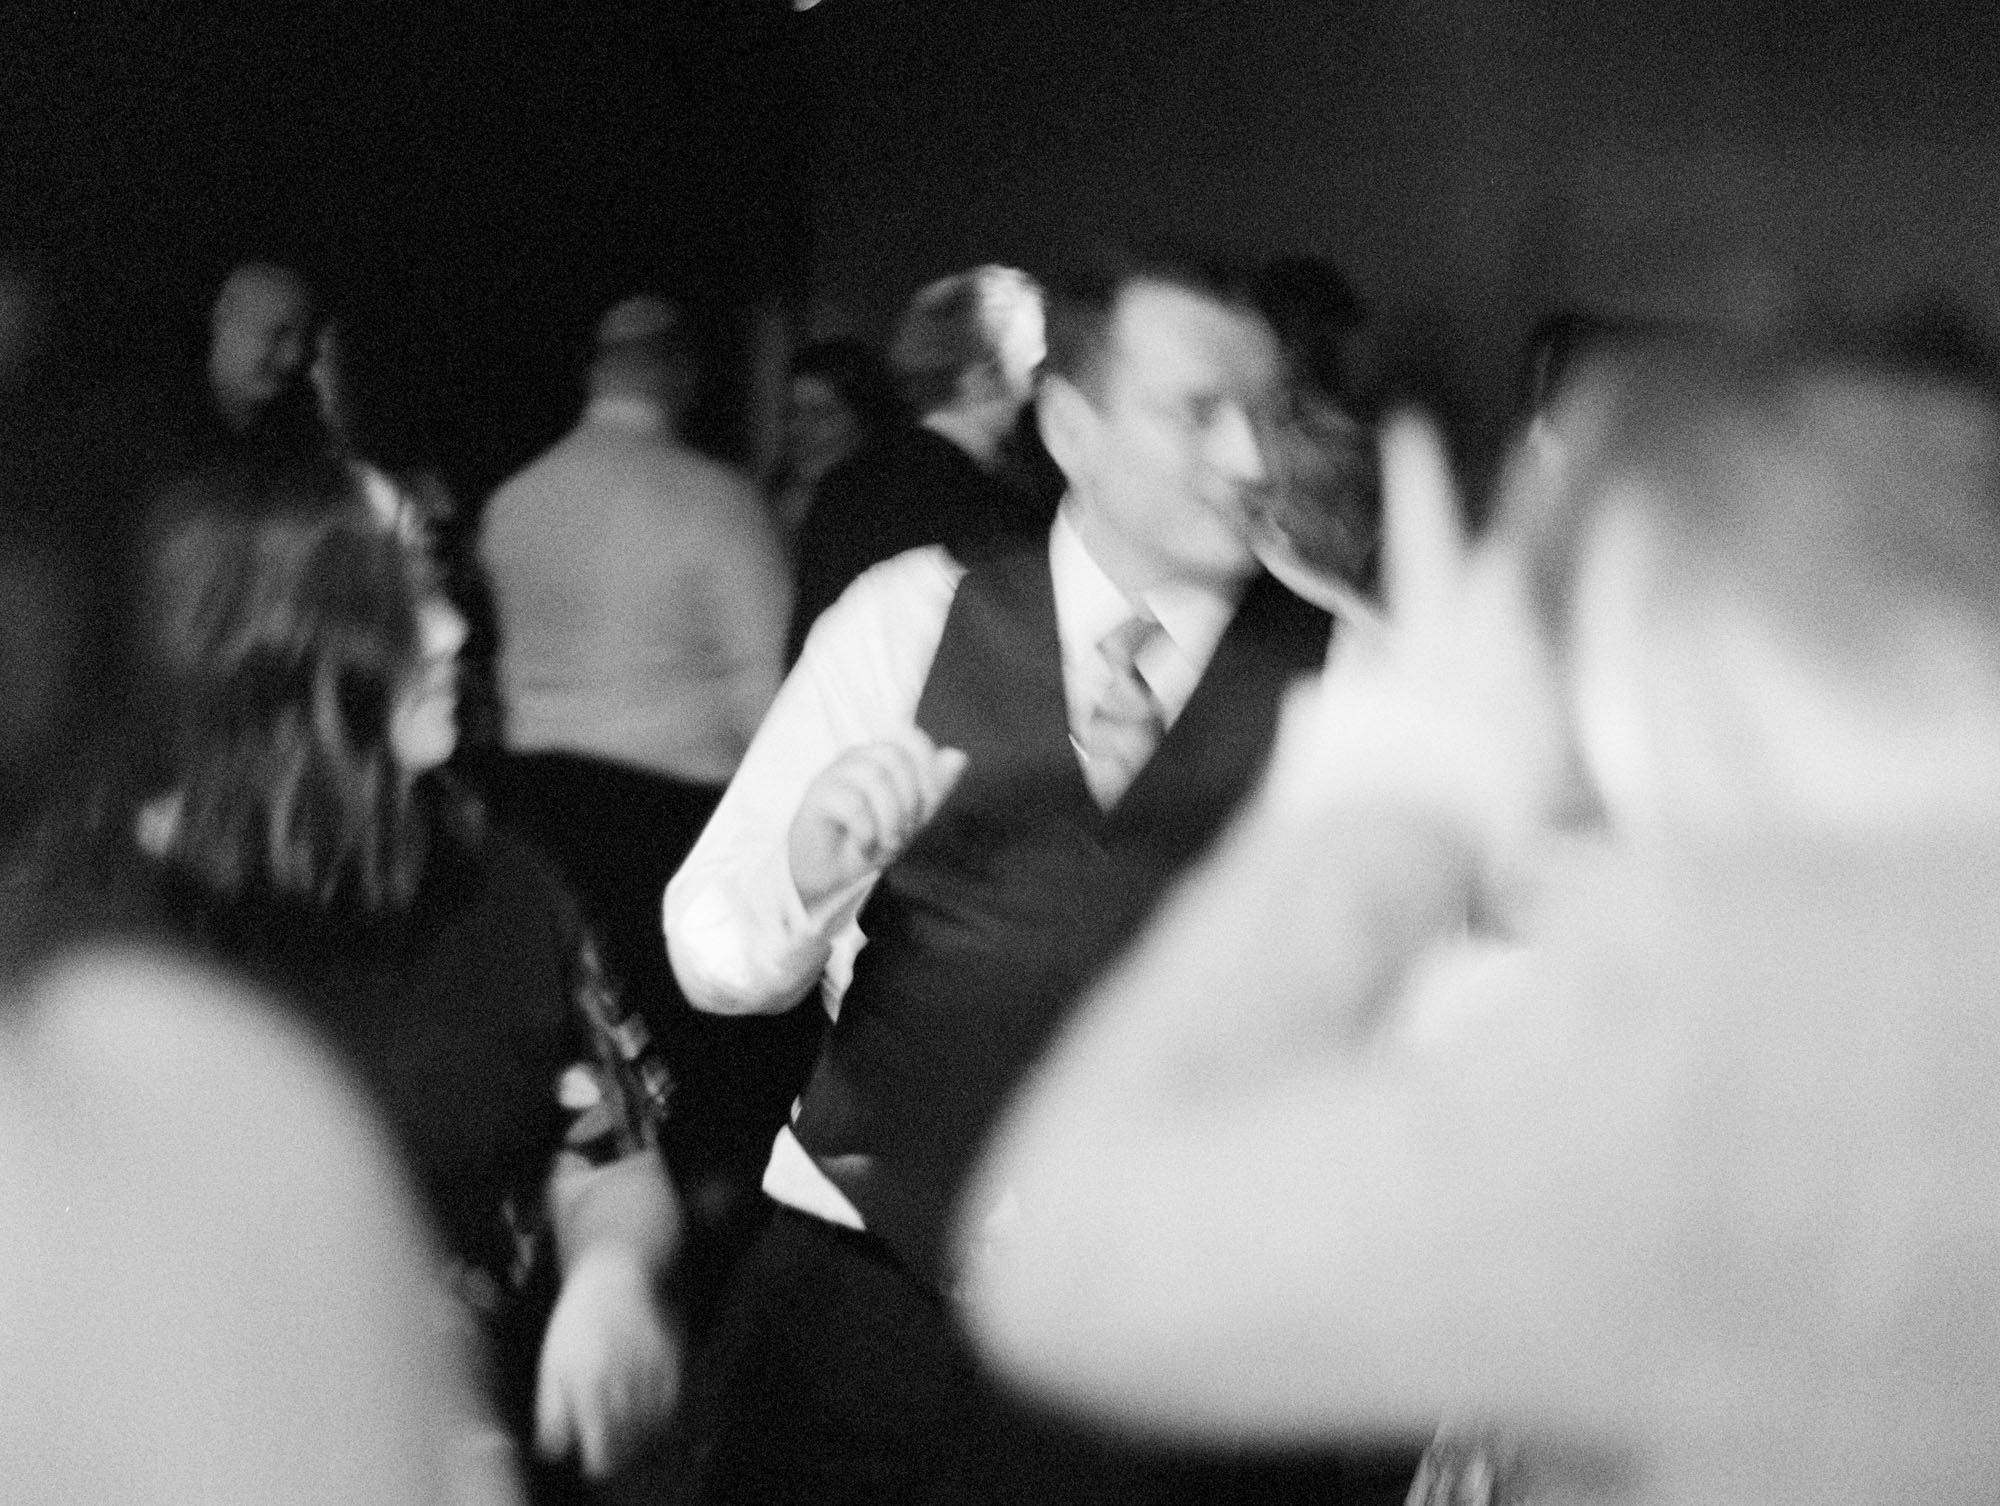 Glen-Ewin-Estate-wedding-photography-103.jpg